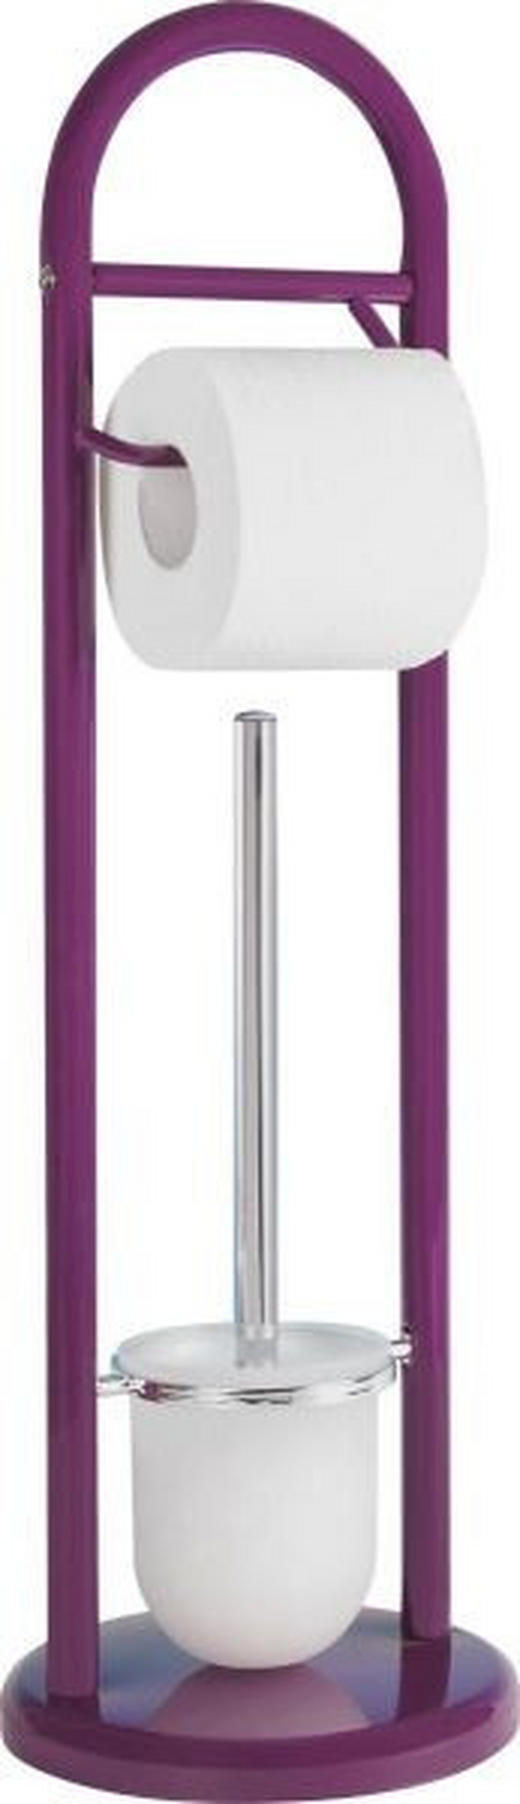 WC-BÜRSTENGARNITUR - Chromfarben/Lila, Basics, Kunststoff (19/63cm)